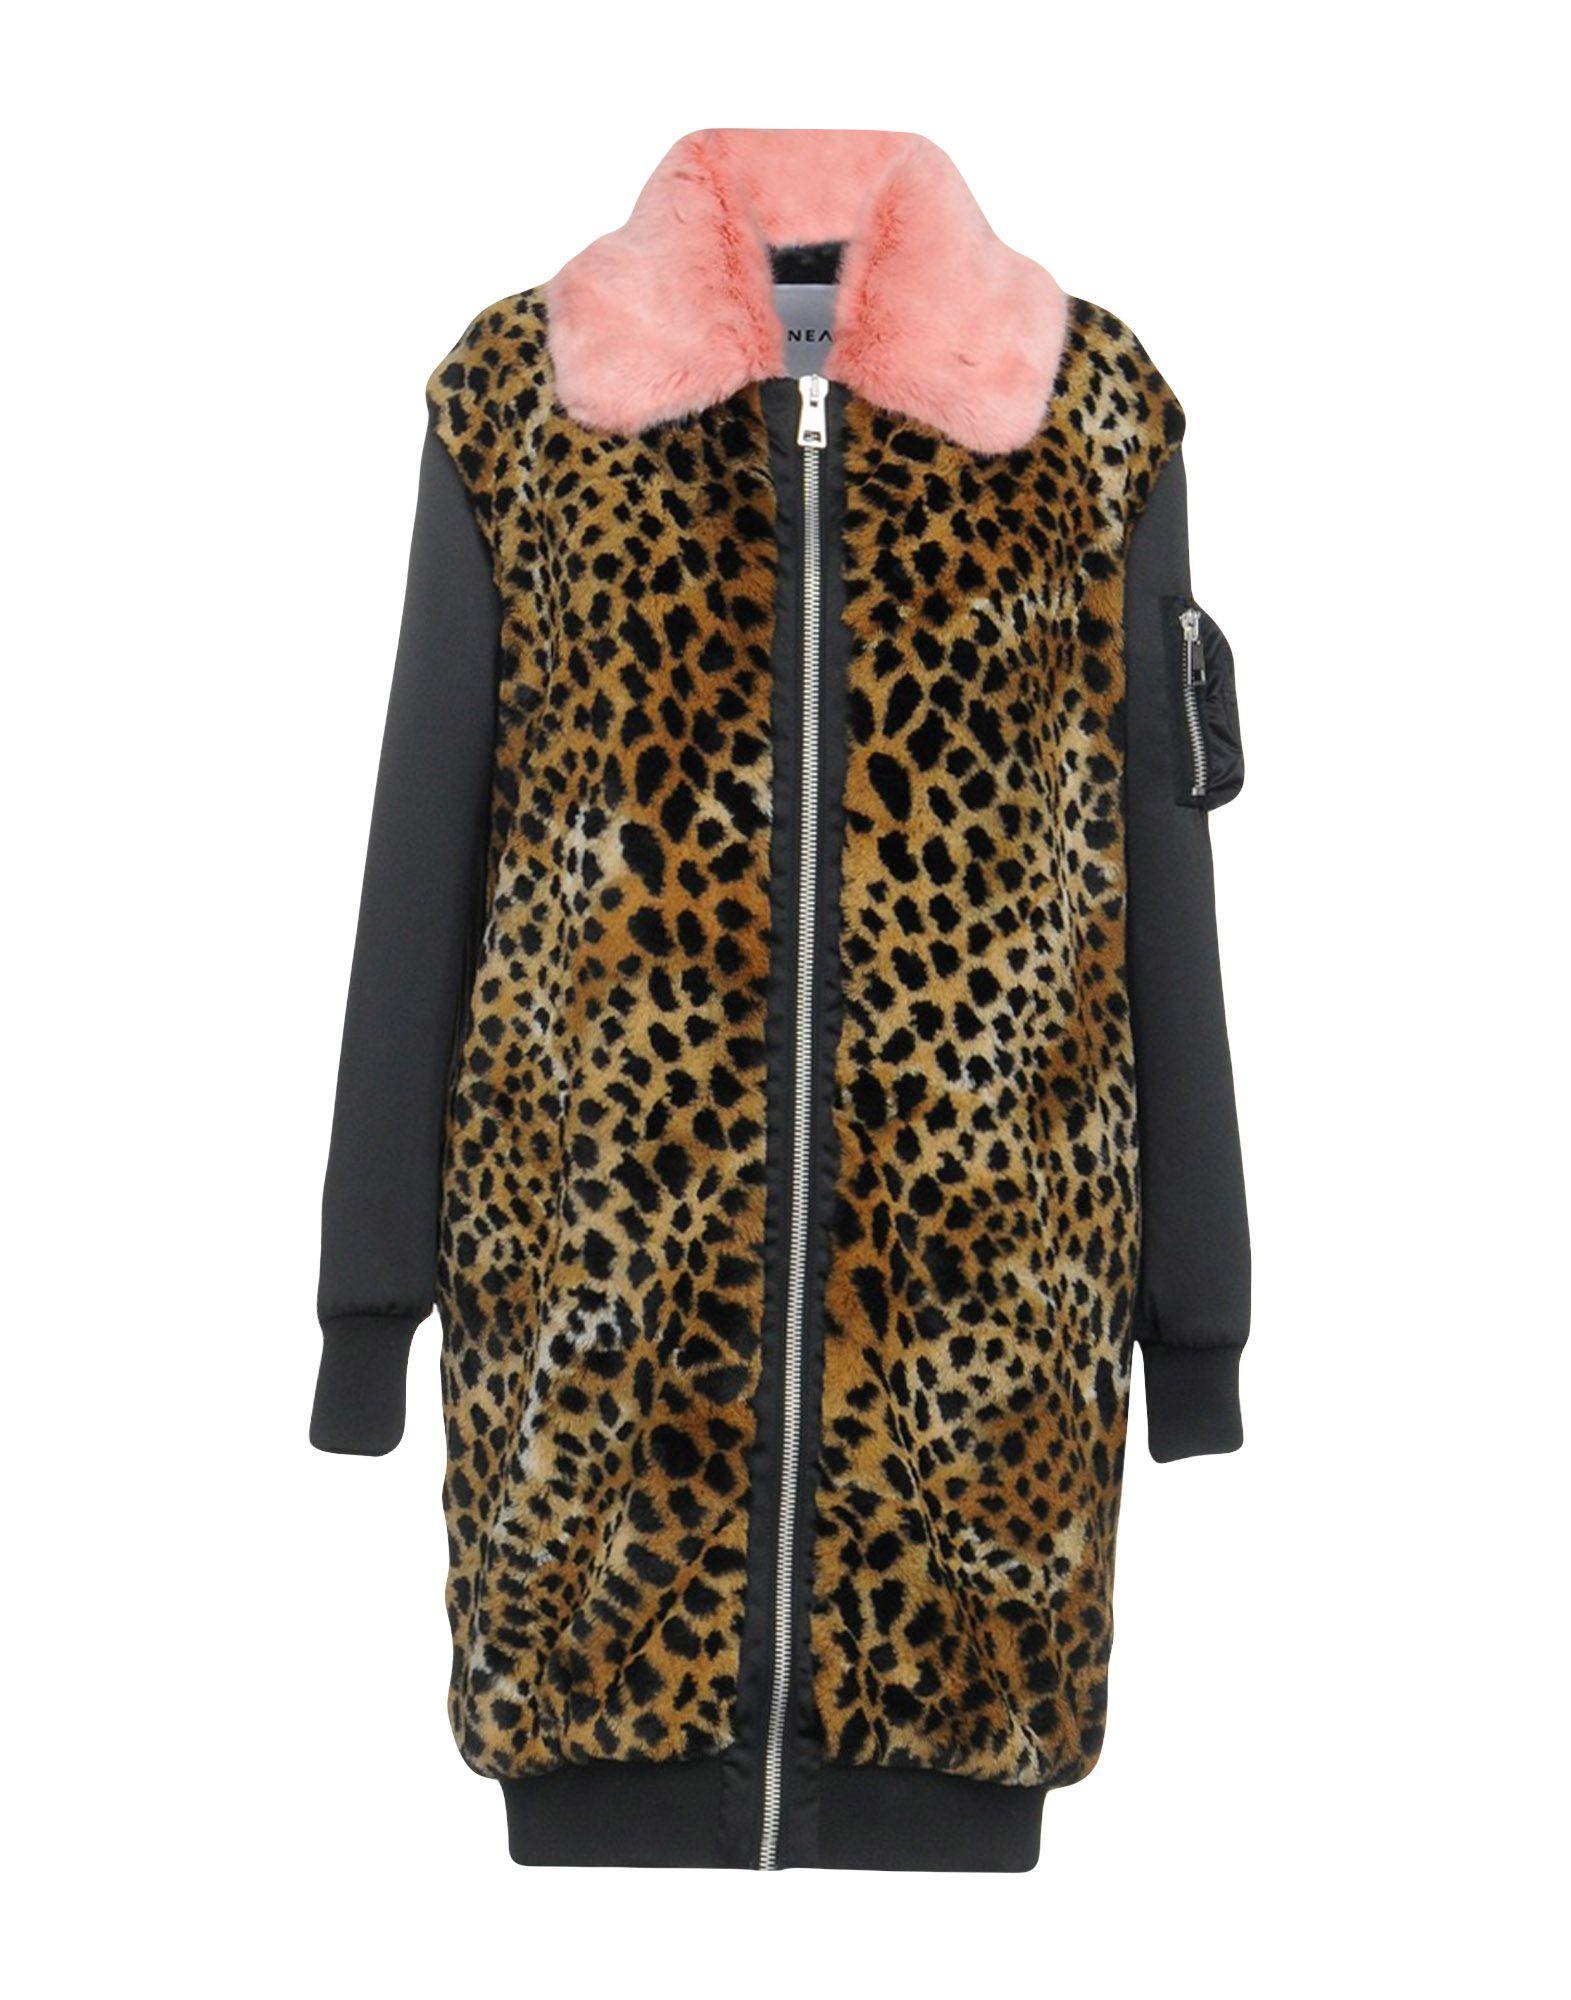 Ainea Women's Teddy Coat Polyester